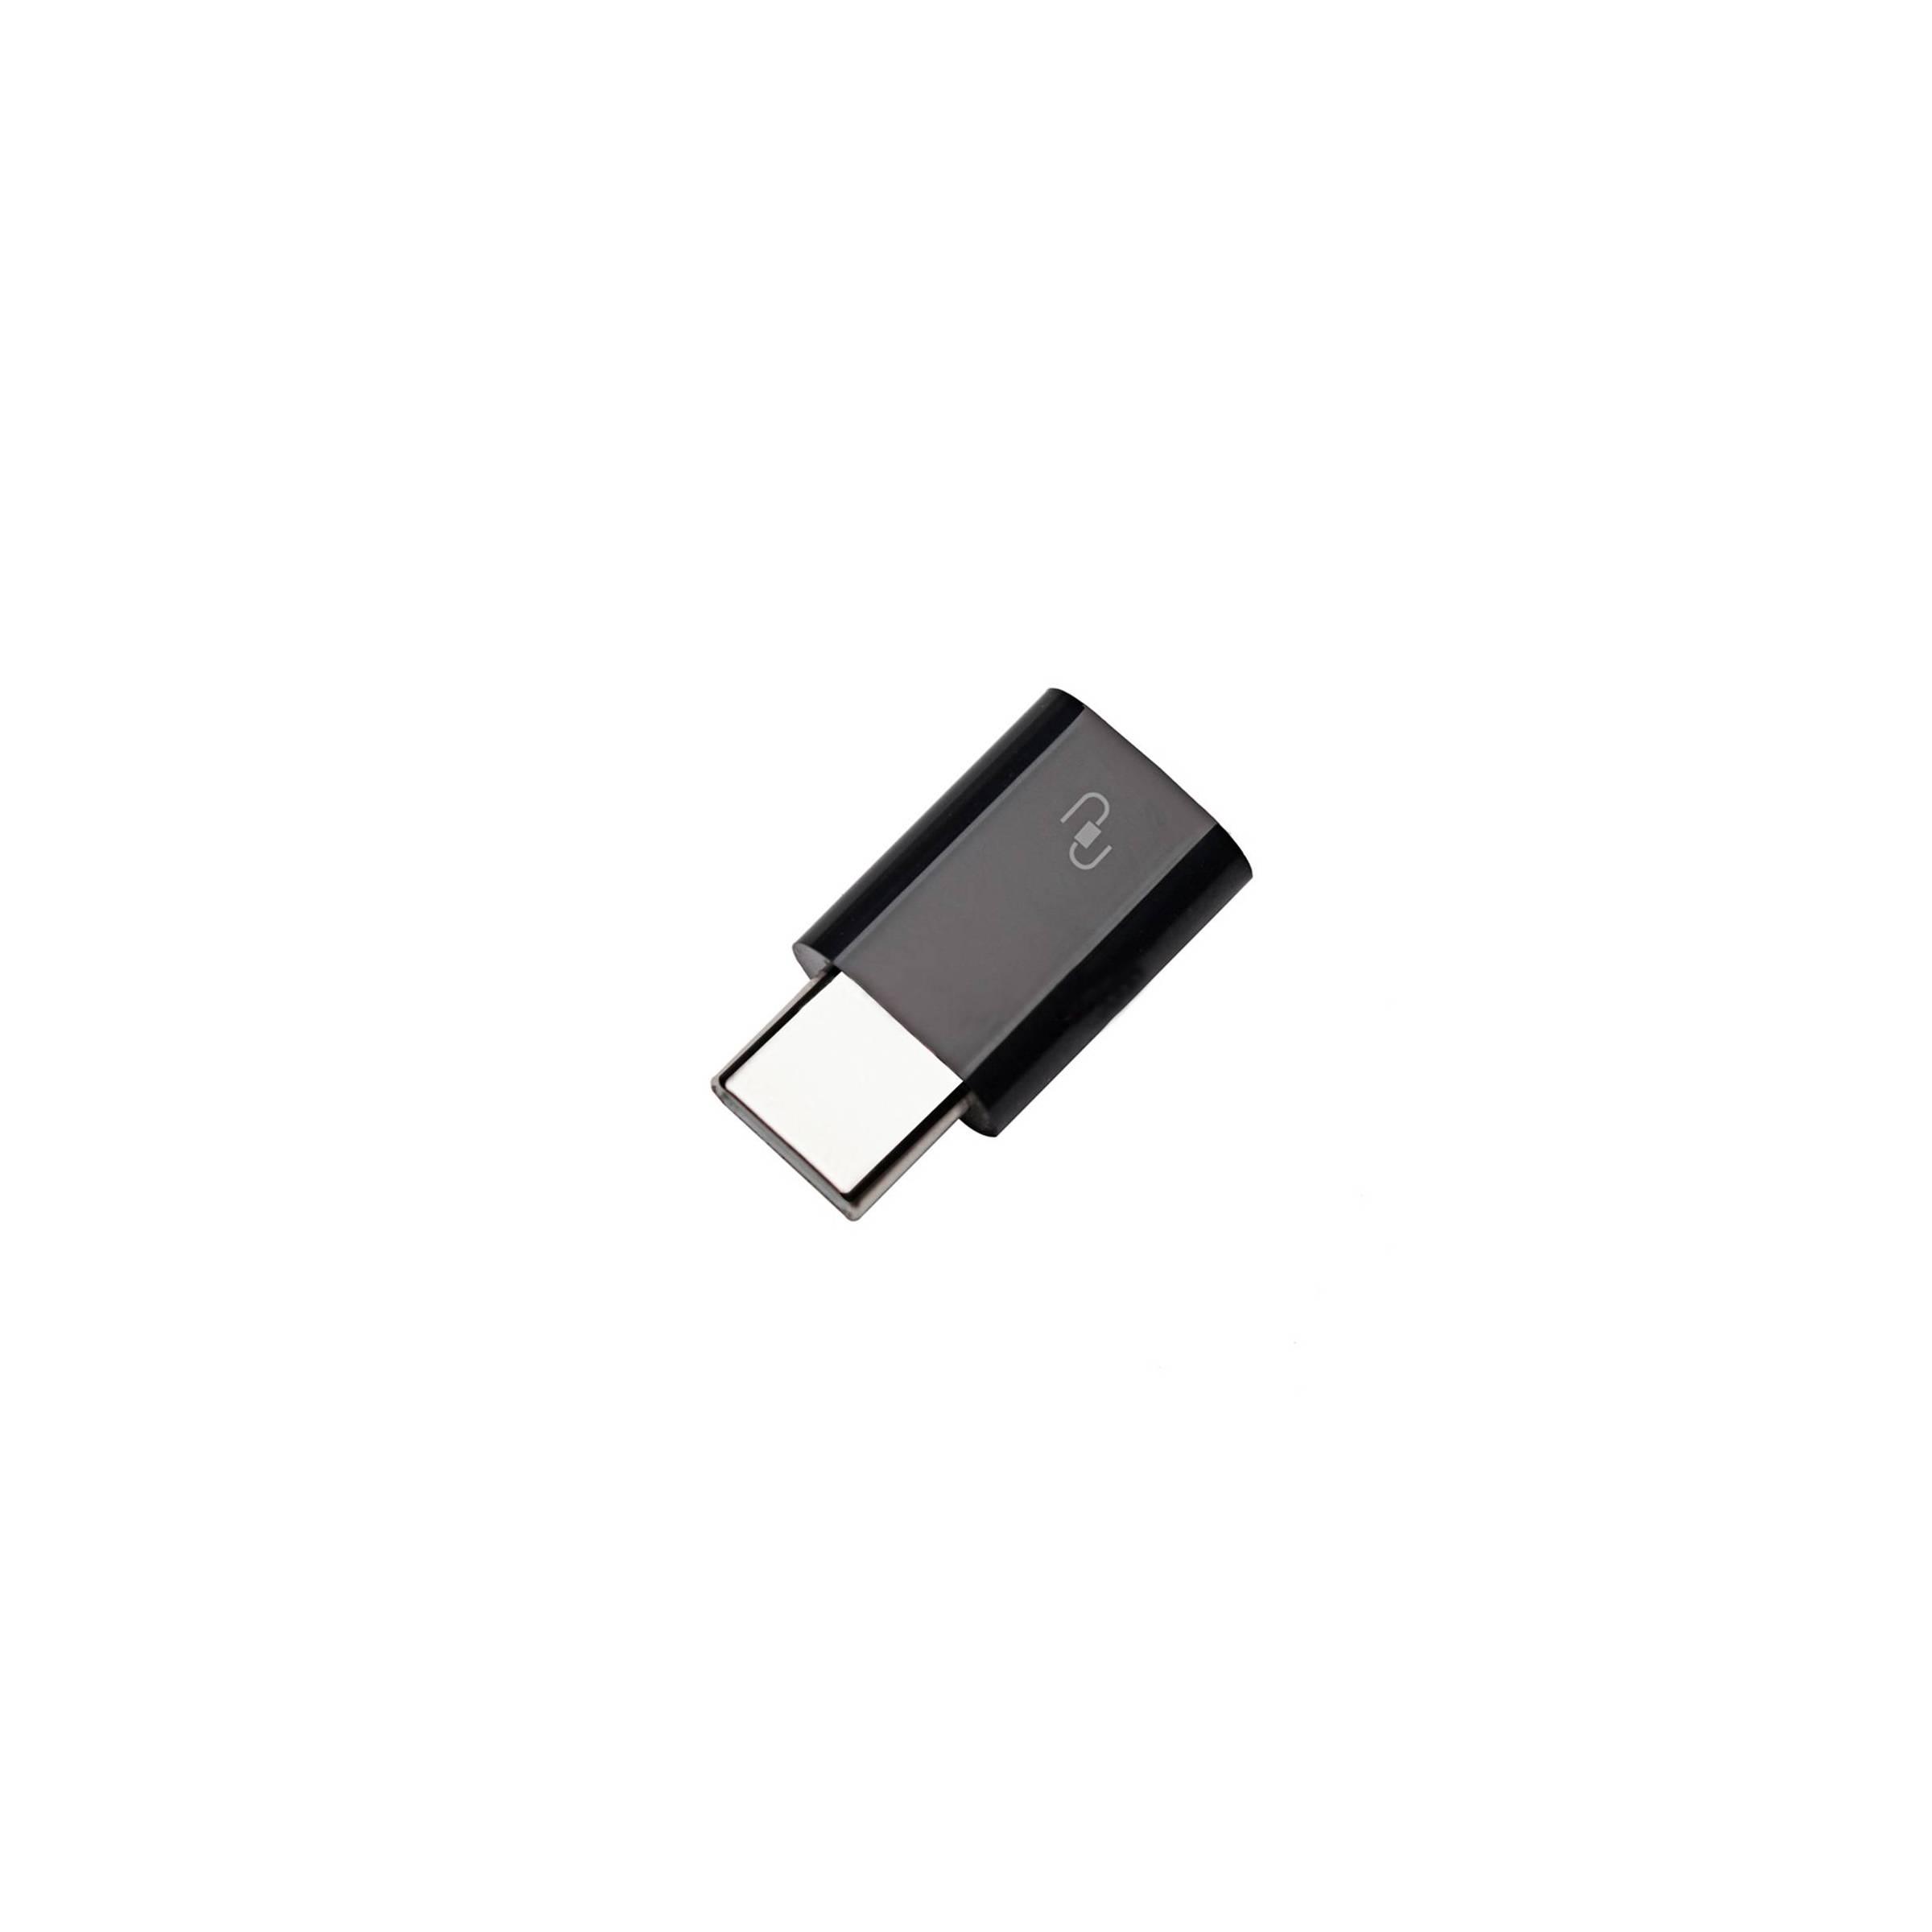 xiaomi Xiaomi micro usb til usb 3.1 type-c adapter på mackabler.dk